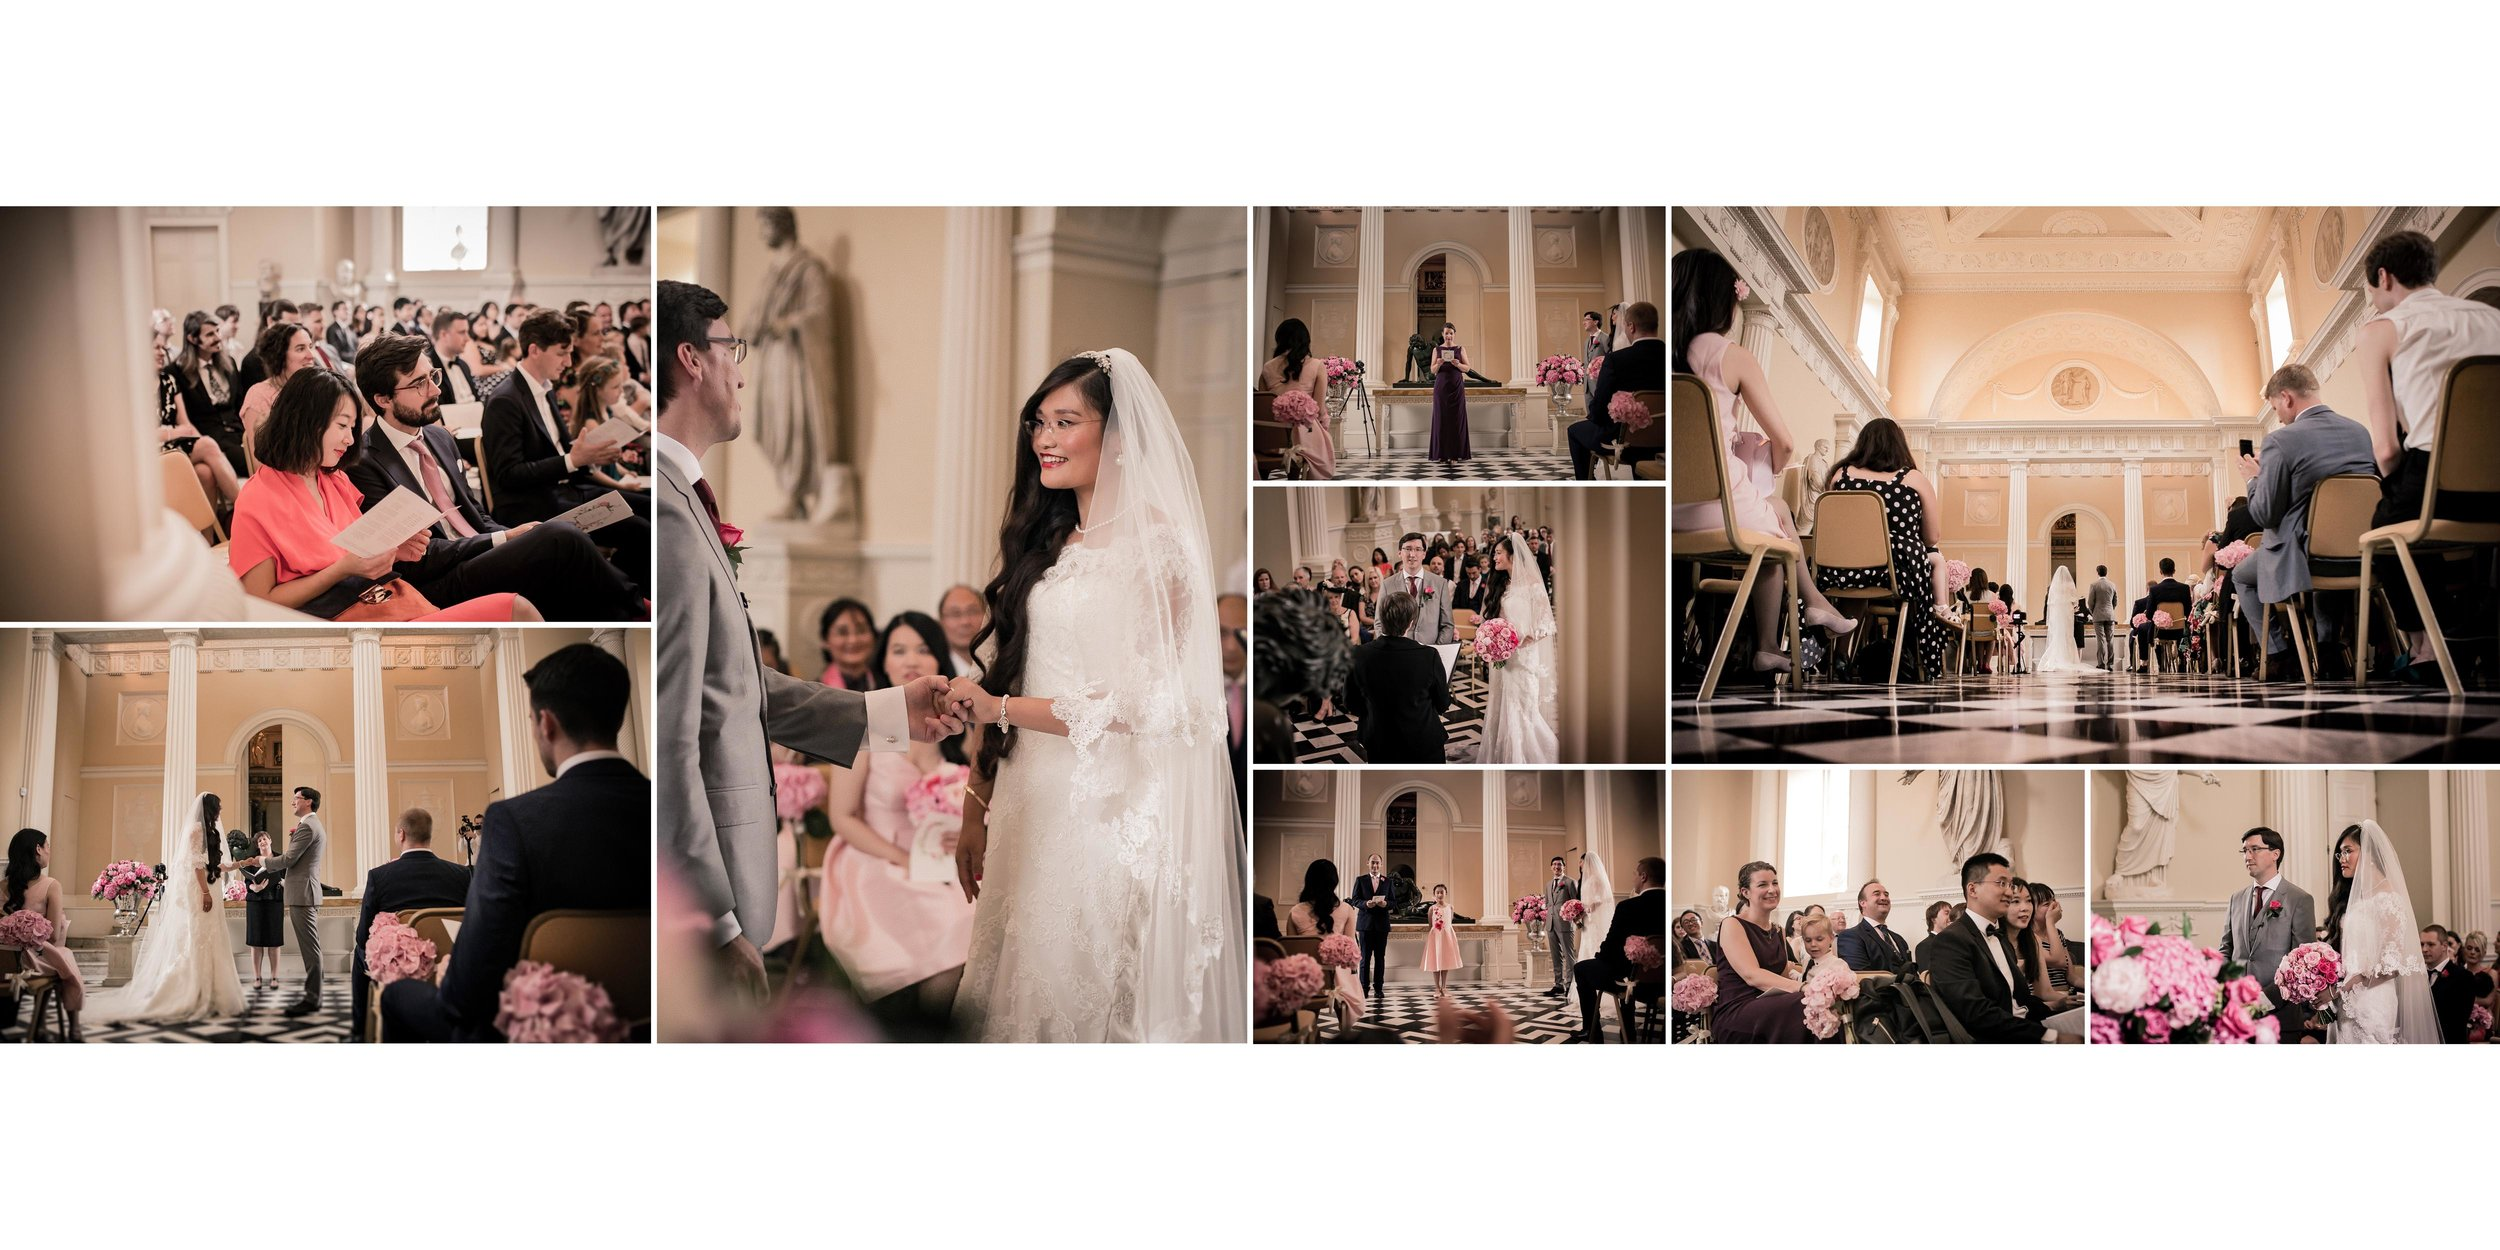 wedding_photographer_surrey_26.jpg